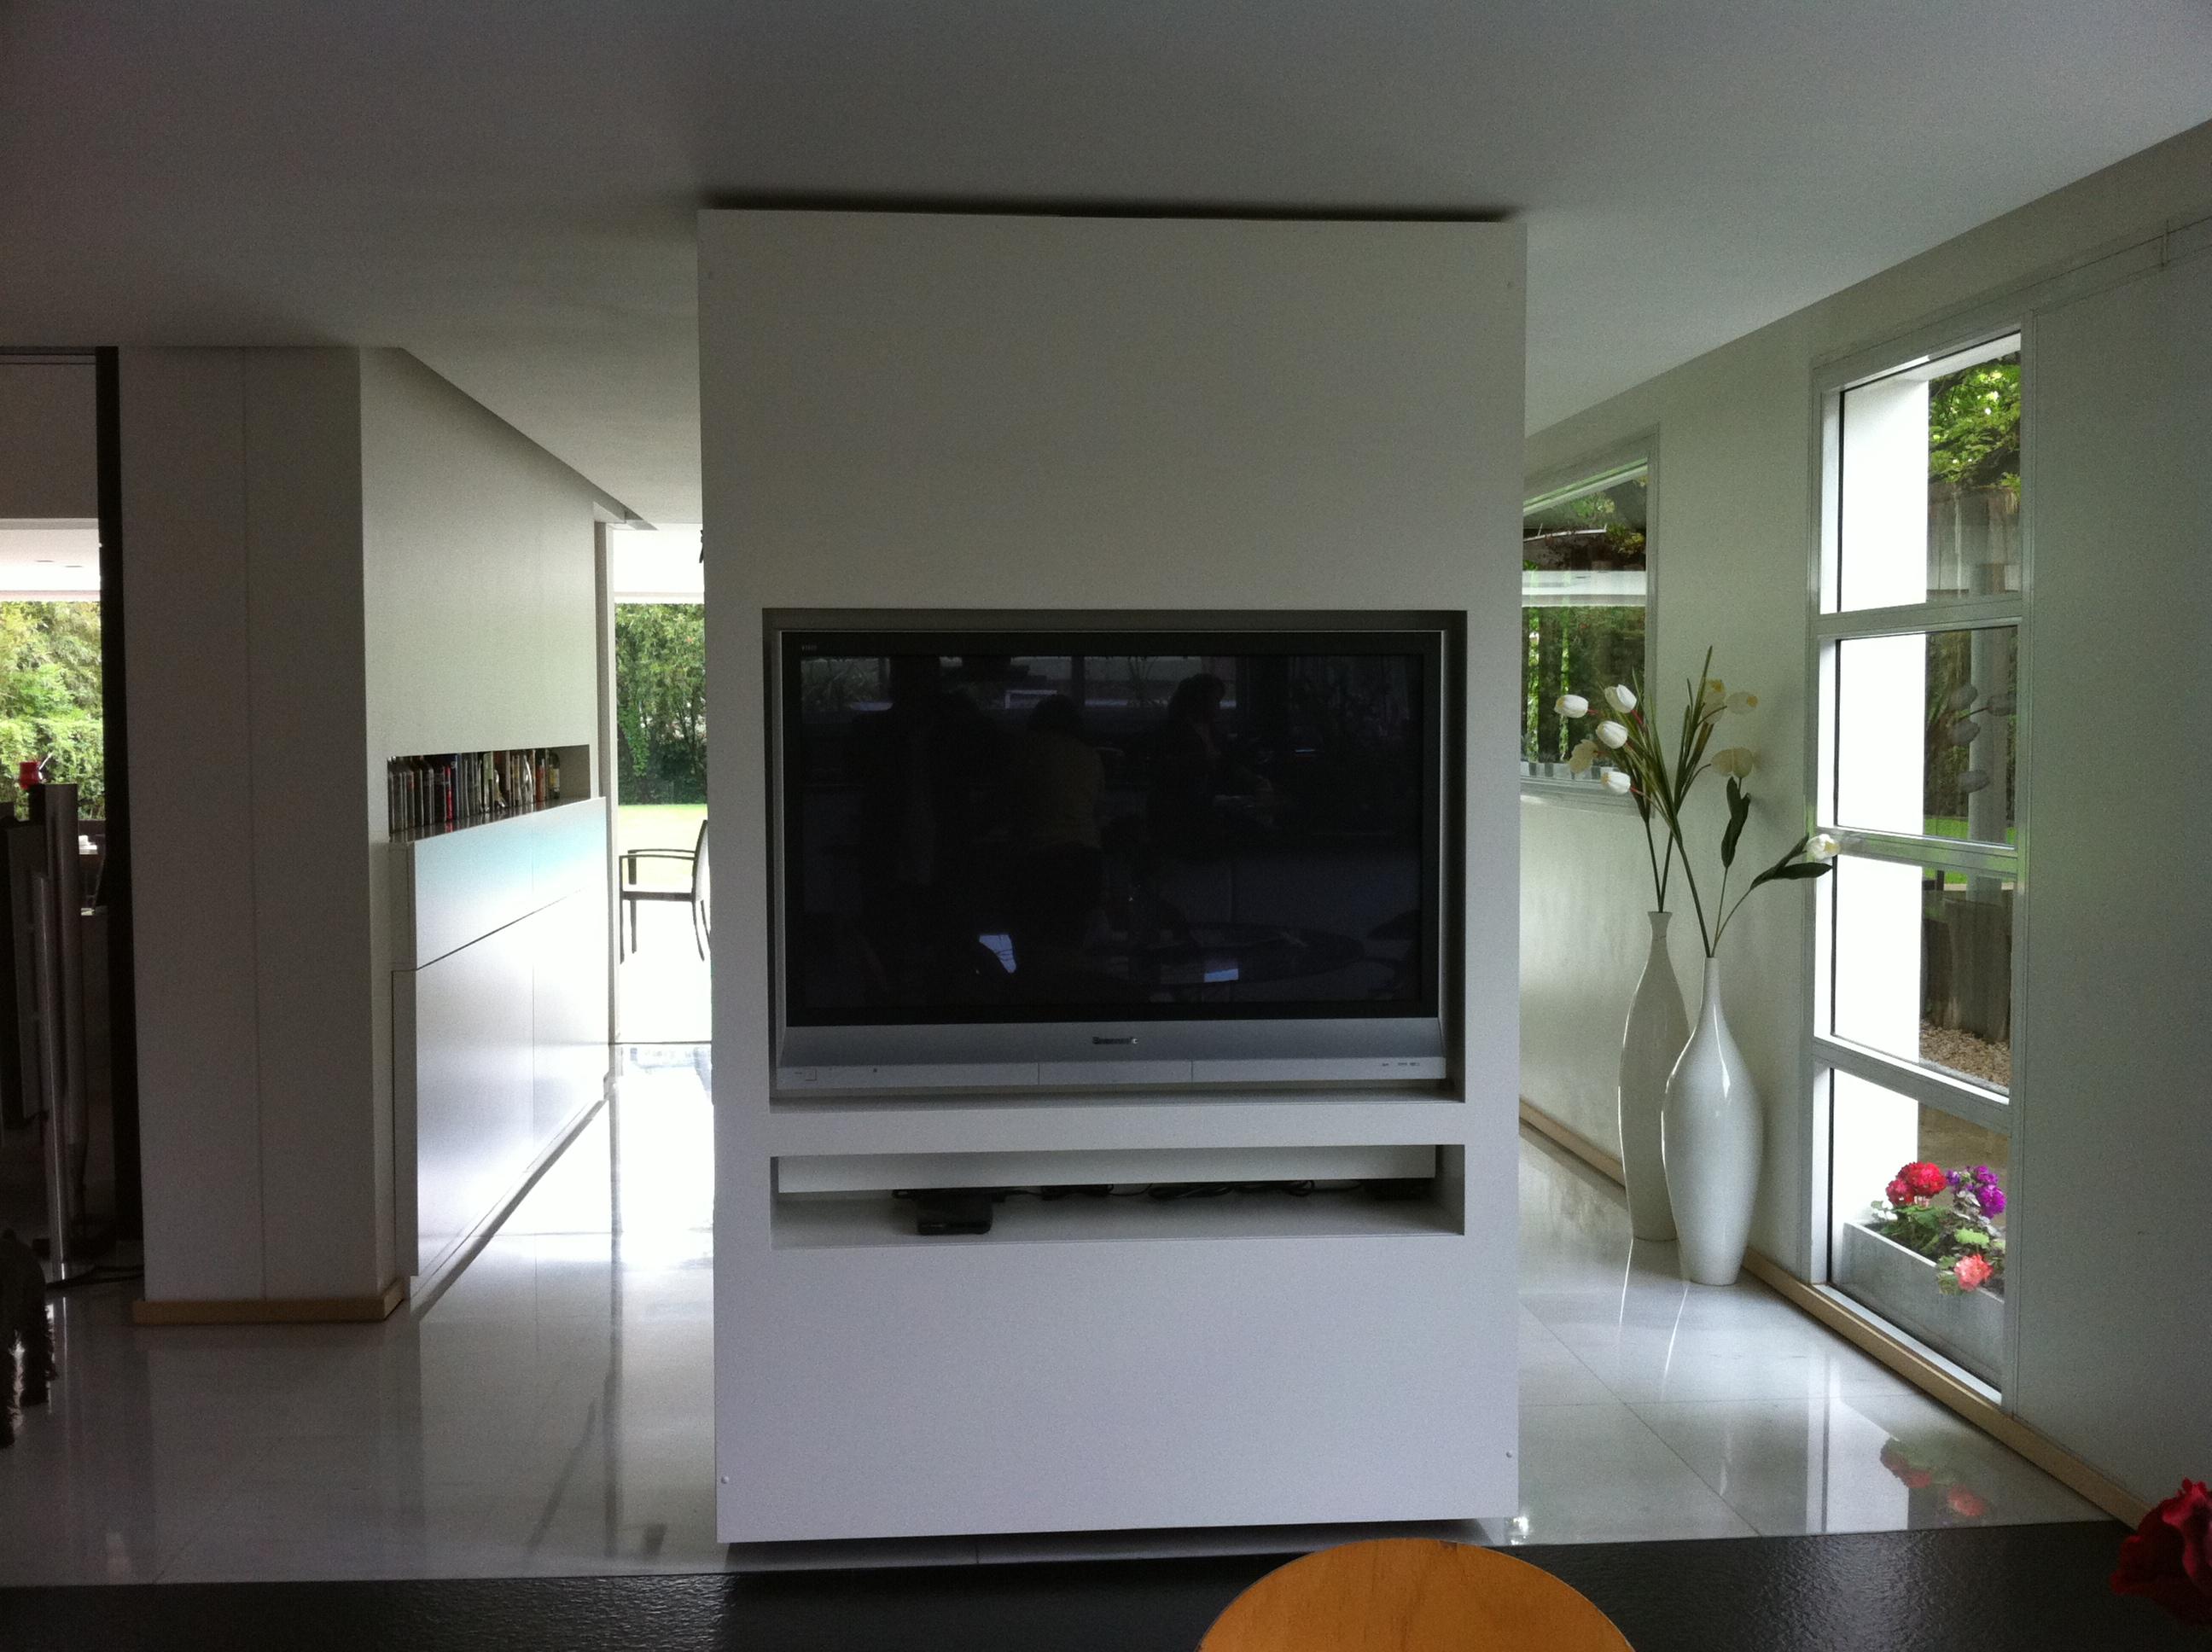 Mueble Tv Giratorio.